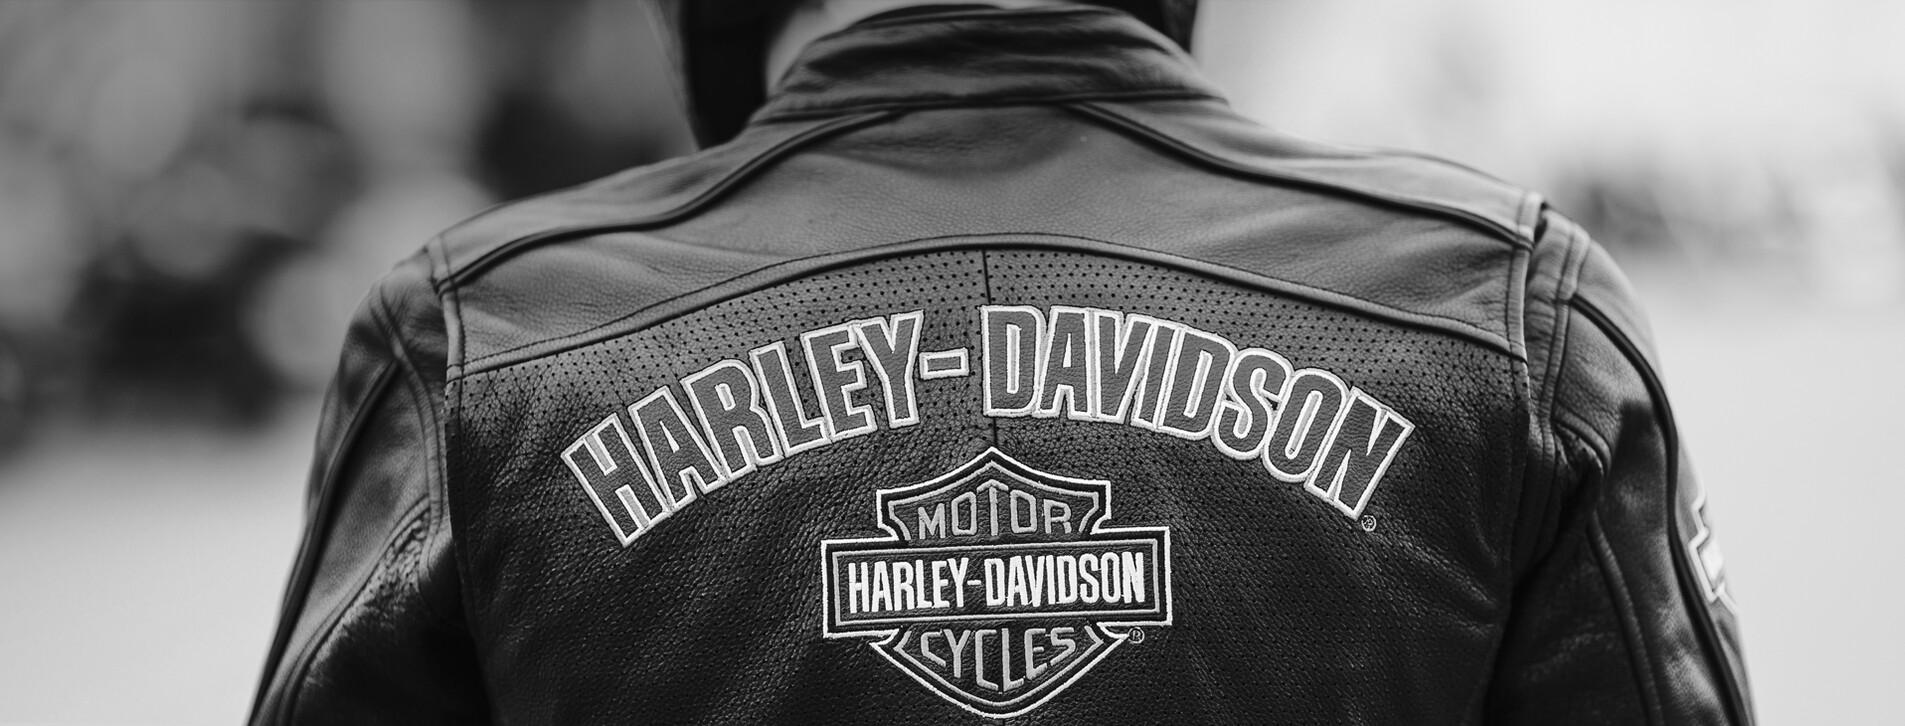 Фото 1 - Урок на Harley-Davidson